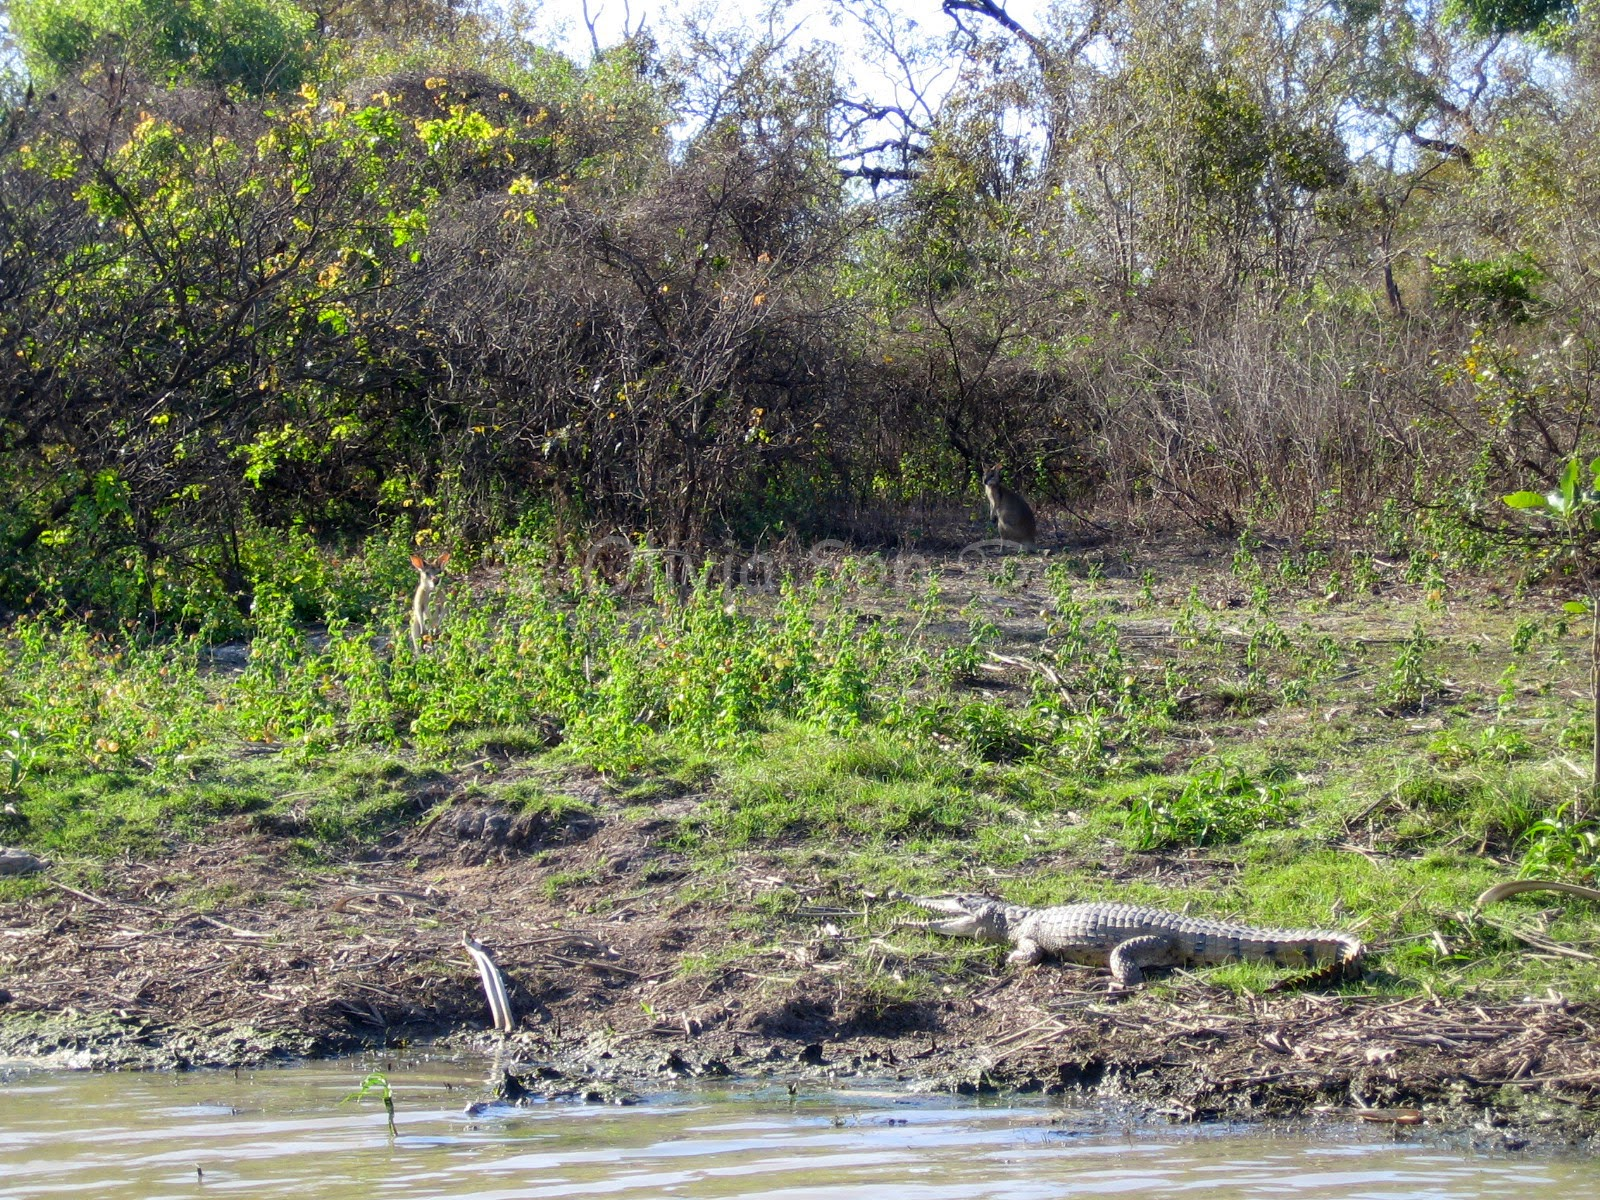 Crocodile Kakadu National Park, Northern Territory, Australie